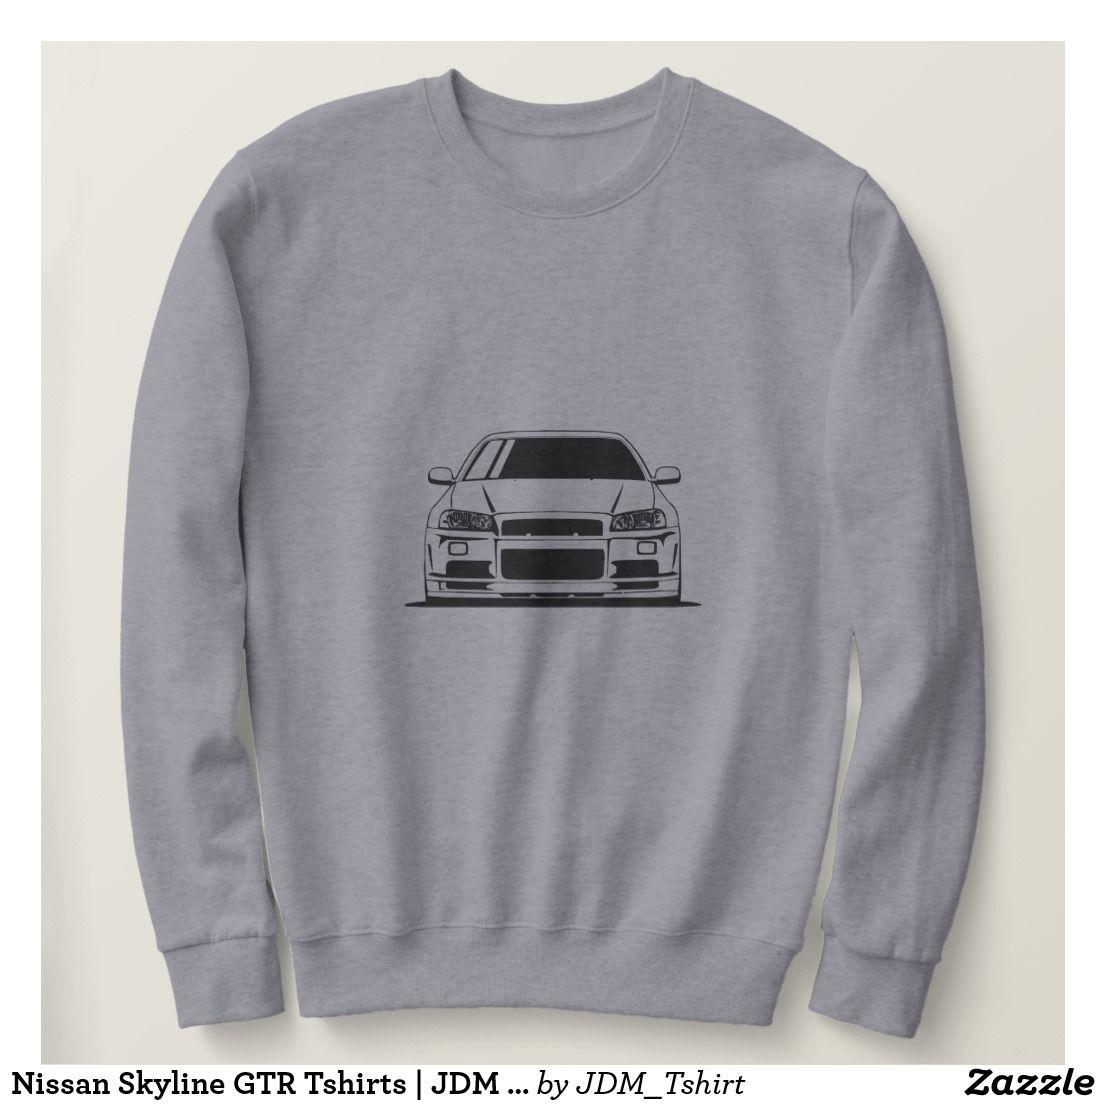 Do You Want To Buy Jdm T Shirts Click The Link International Shipping Jdm T Shirt Nissan Skyline Gtr R34 Toyota Supra M Cars Tees T Shirt Shirt Designs [ 1106 x 1106 Pixel ]